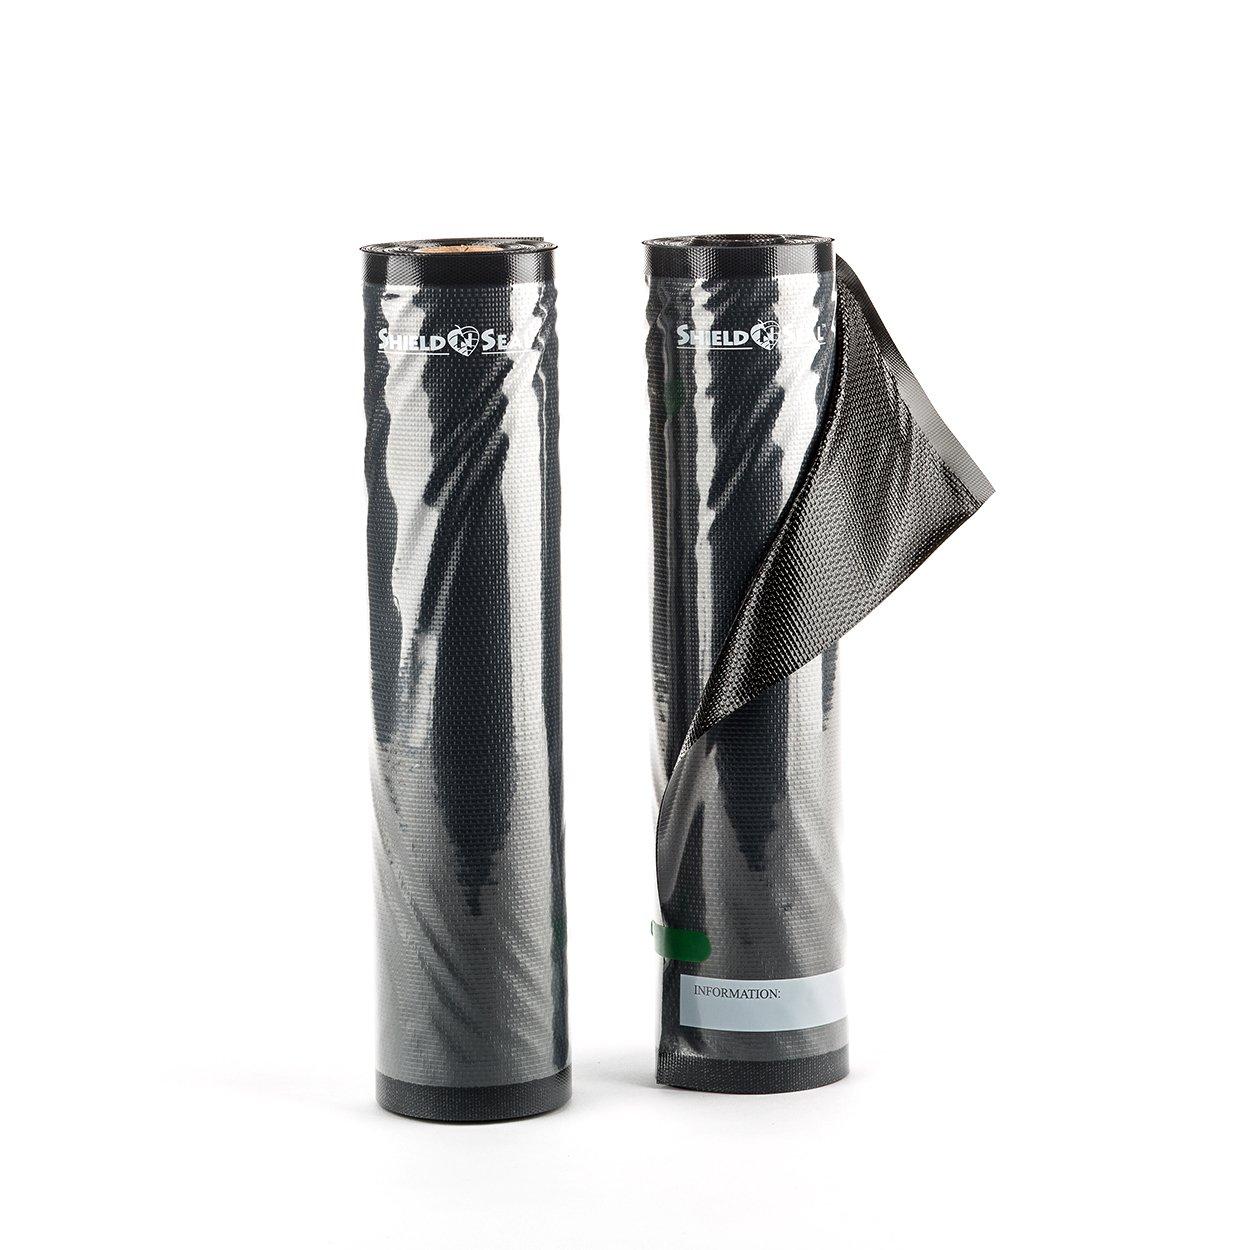 ShieldNSeal 11'' x 19.5' Clear & Black Vacuum Sealer Rolls SNS100 Food Storage Saver Heavy-Duty Bags Sous Vide